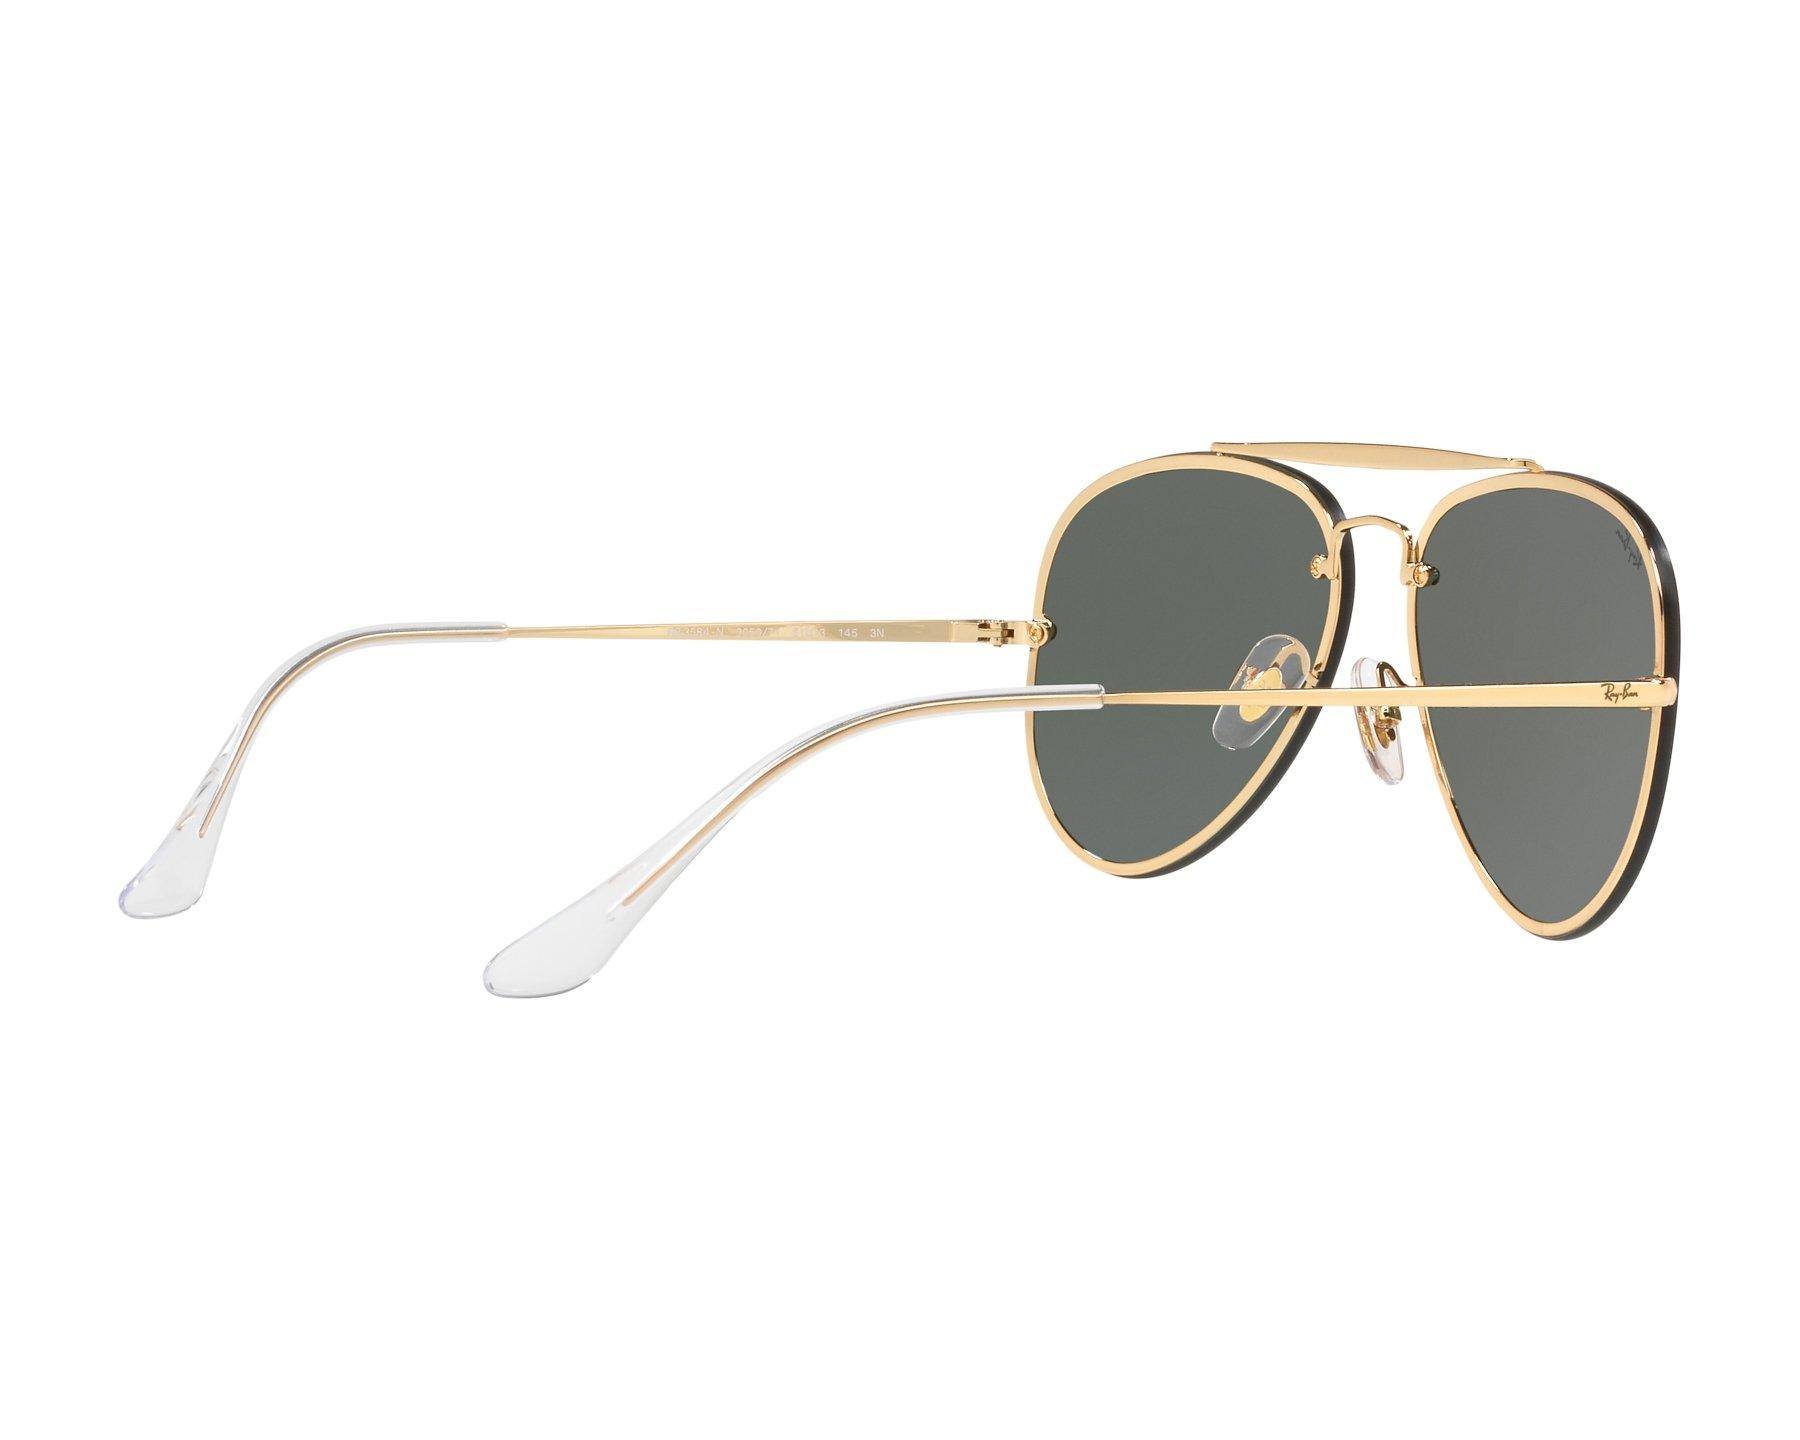 0d829ba1527 Sunglasses Ray-Ban RB-3584-N 905071 58-13 Gold 360 degree